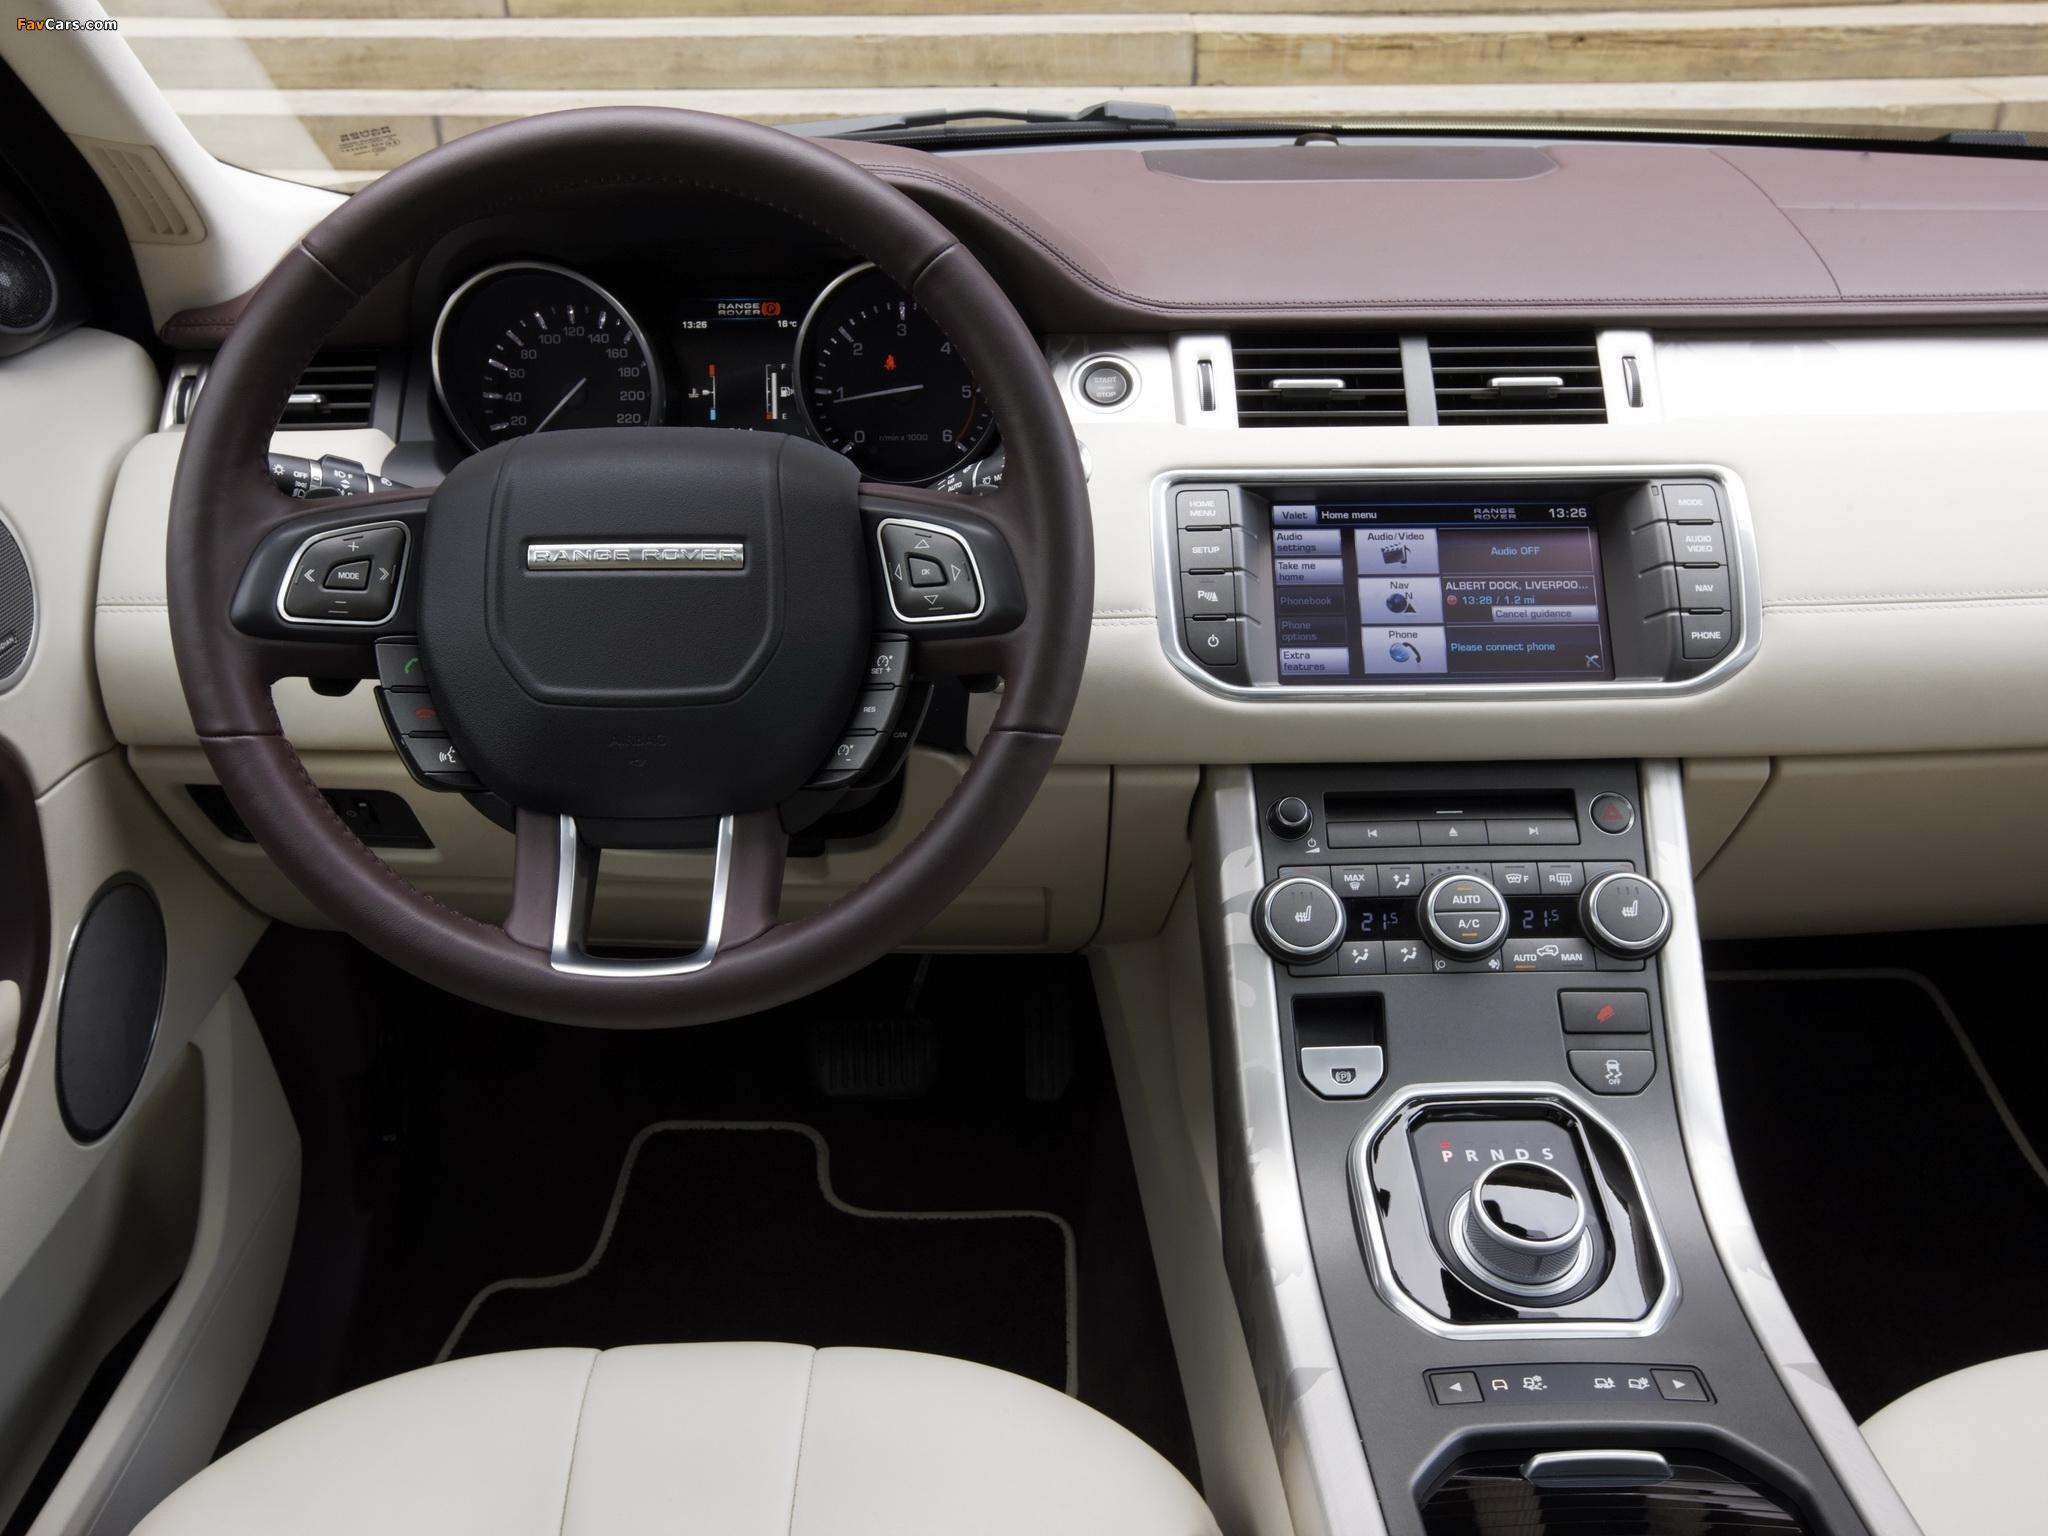 Range Rover Evoque Prestige 2011 images (2048 x 1536)